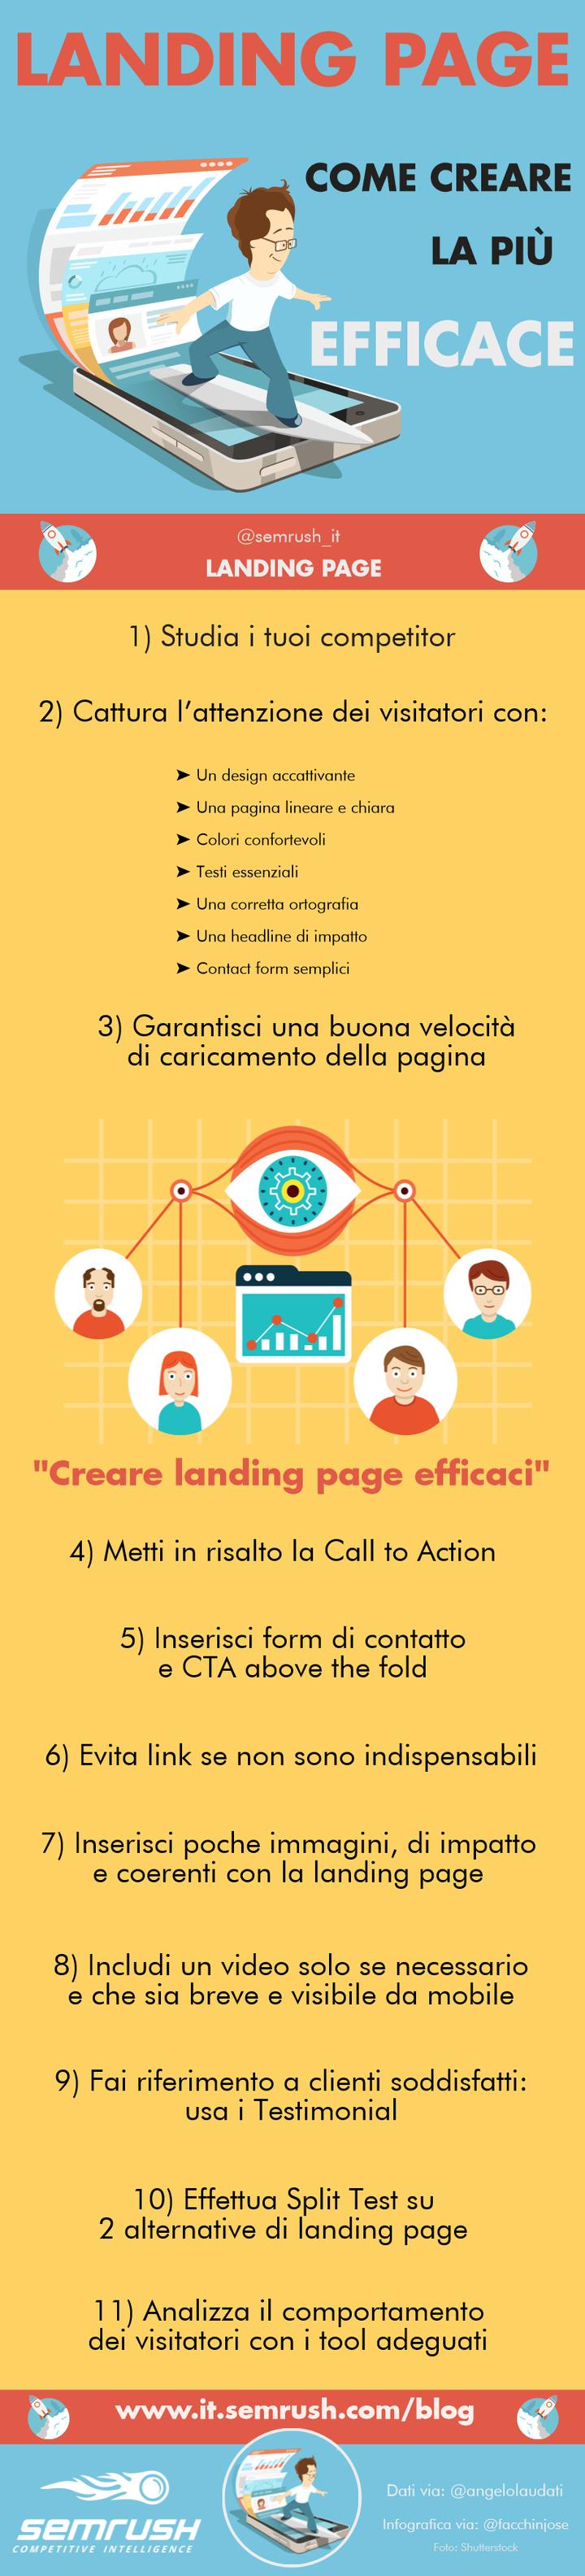 Infografica: come creare landing page efficaci